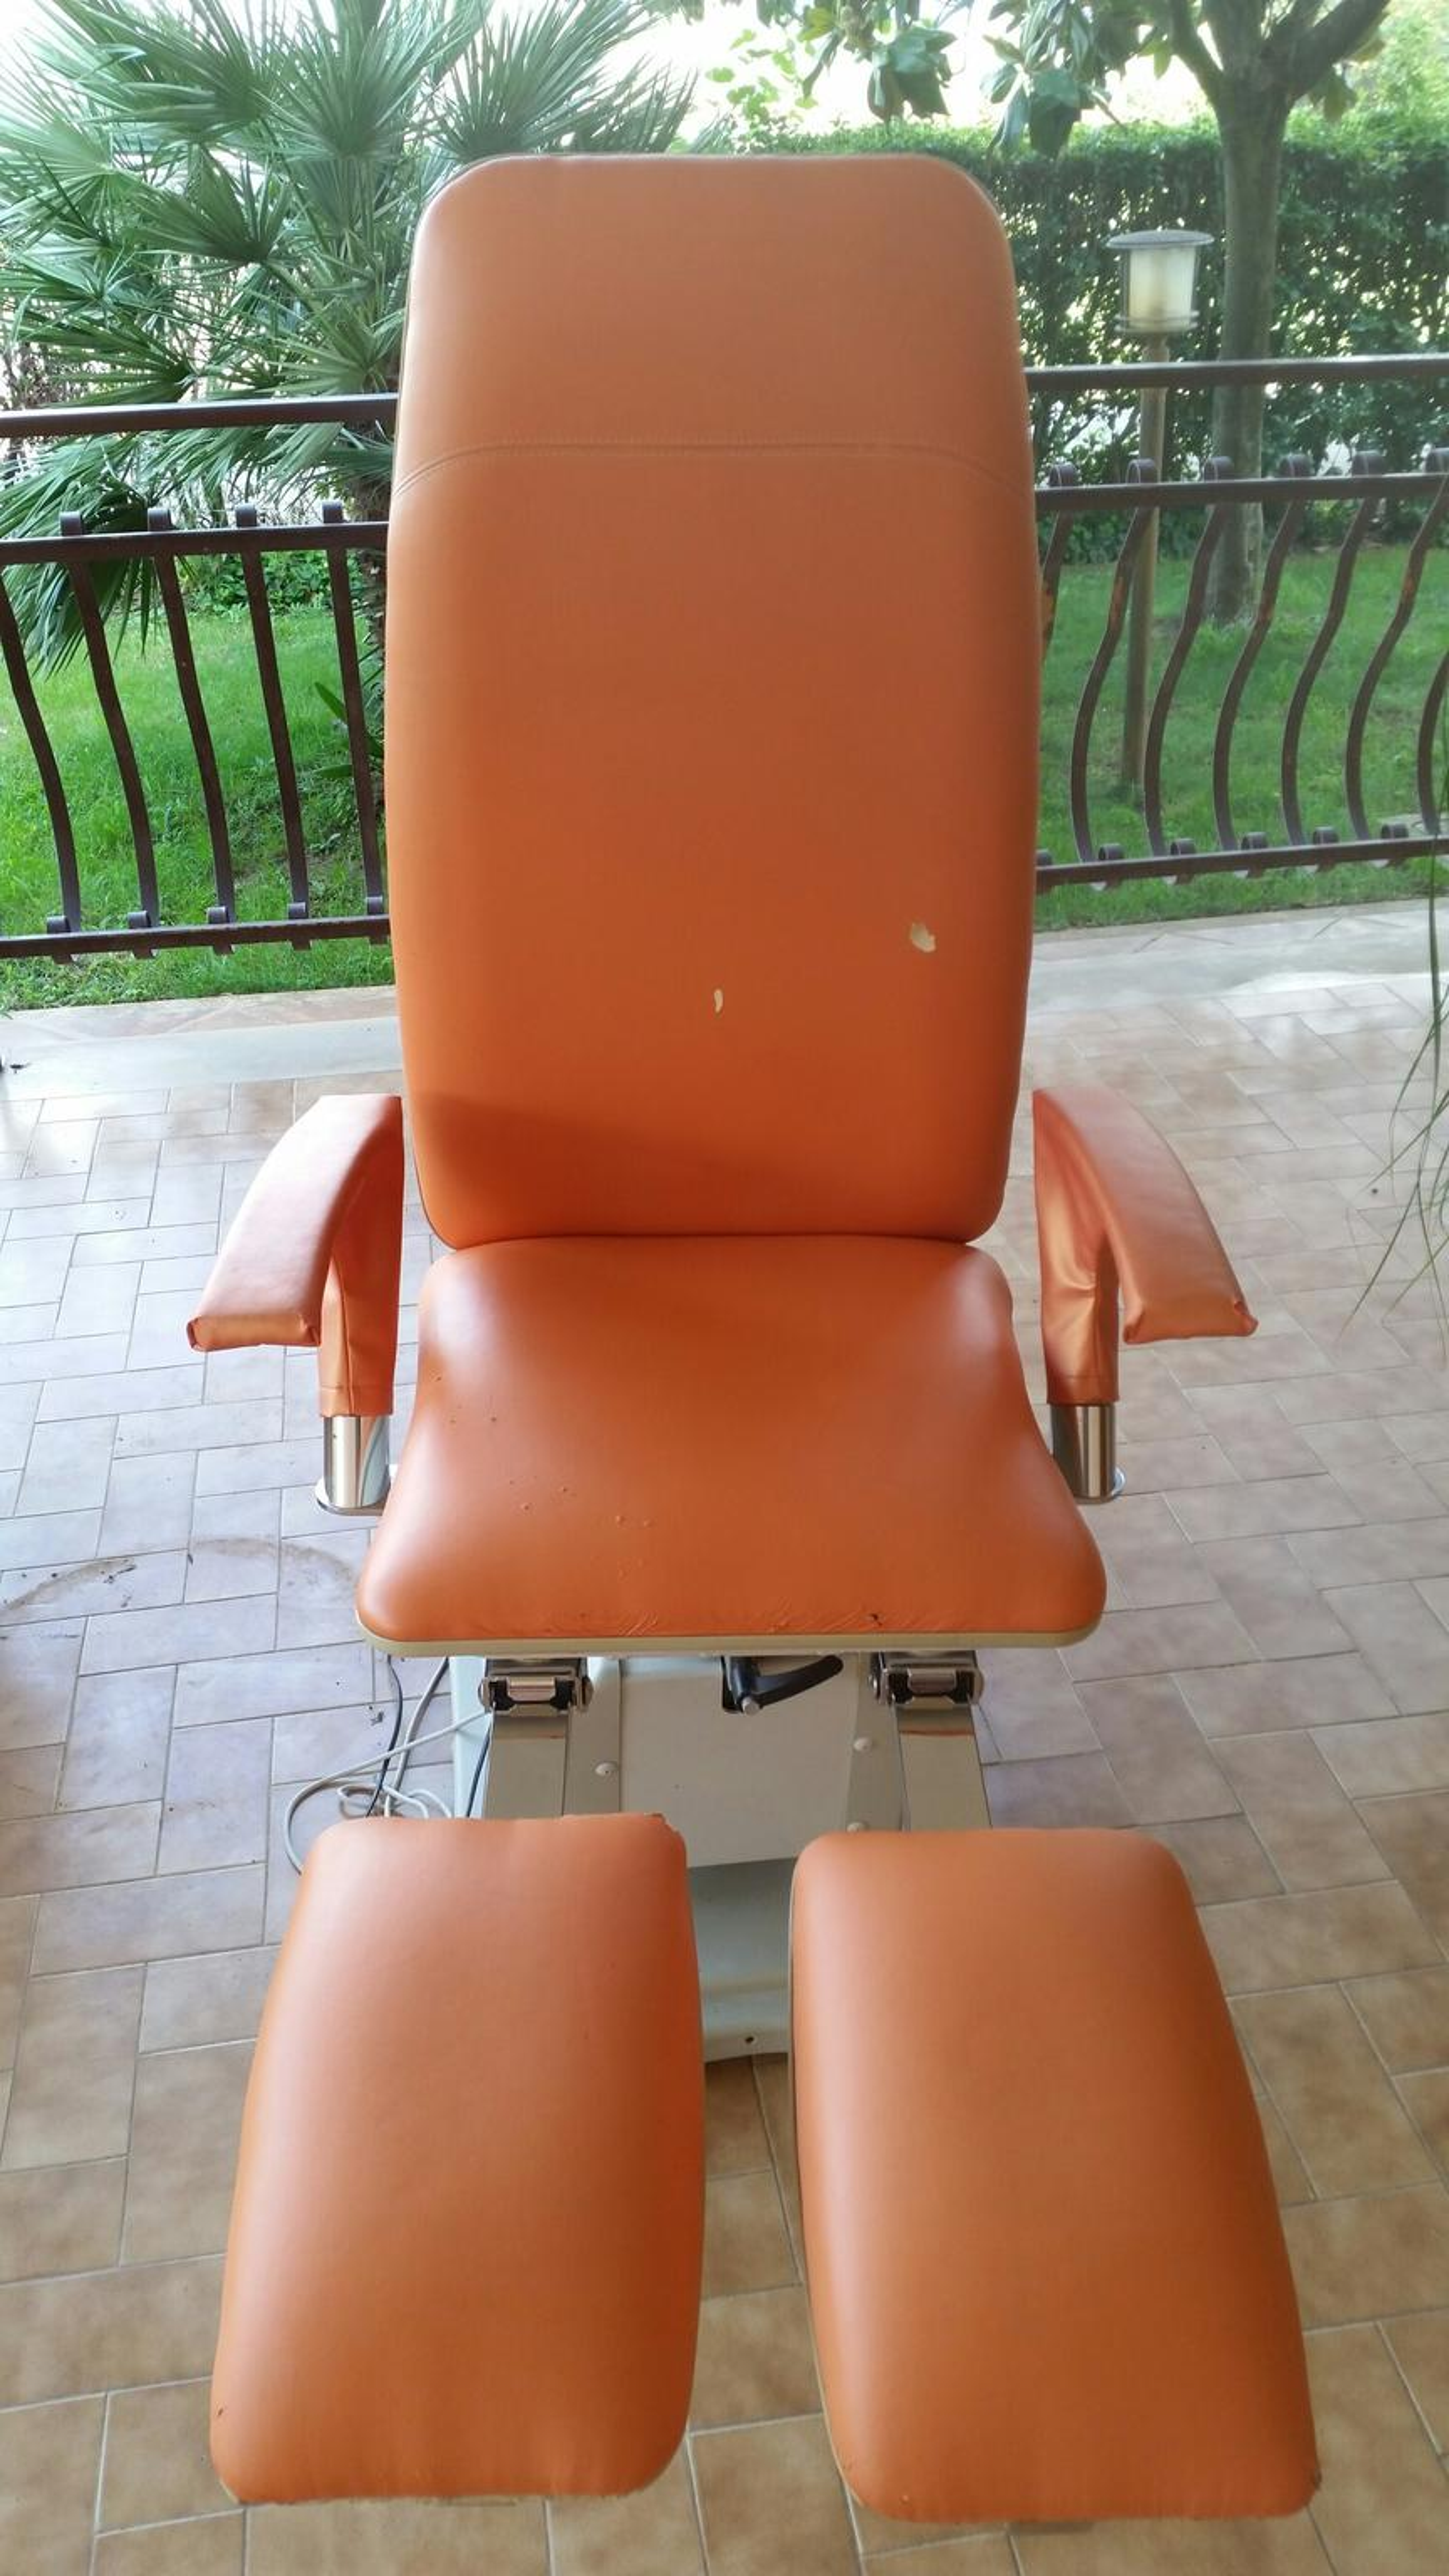 Poltrona pedicure vismara: edge sedia podologica u vismara benessere